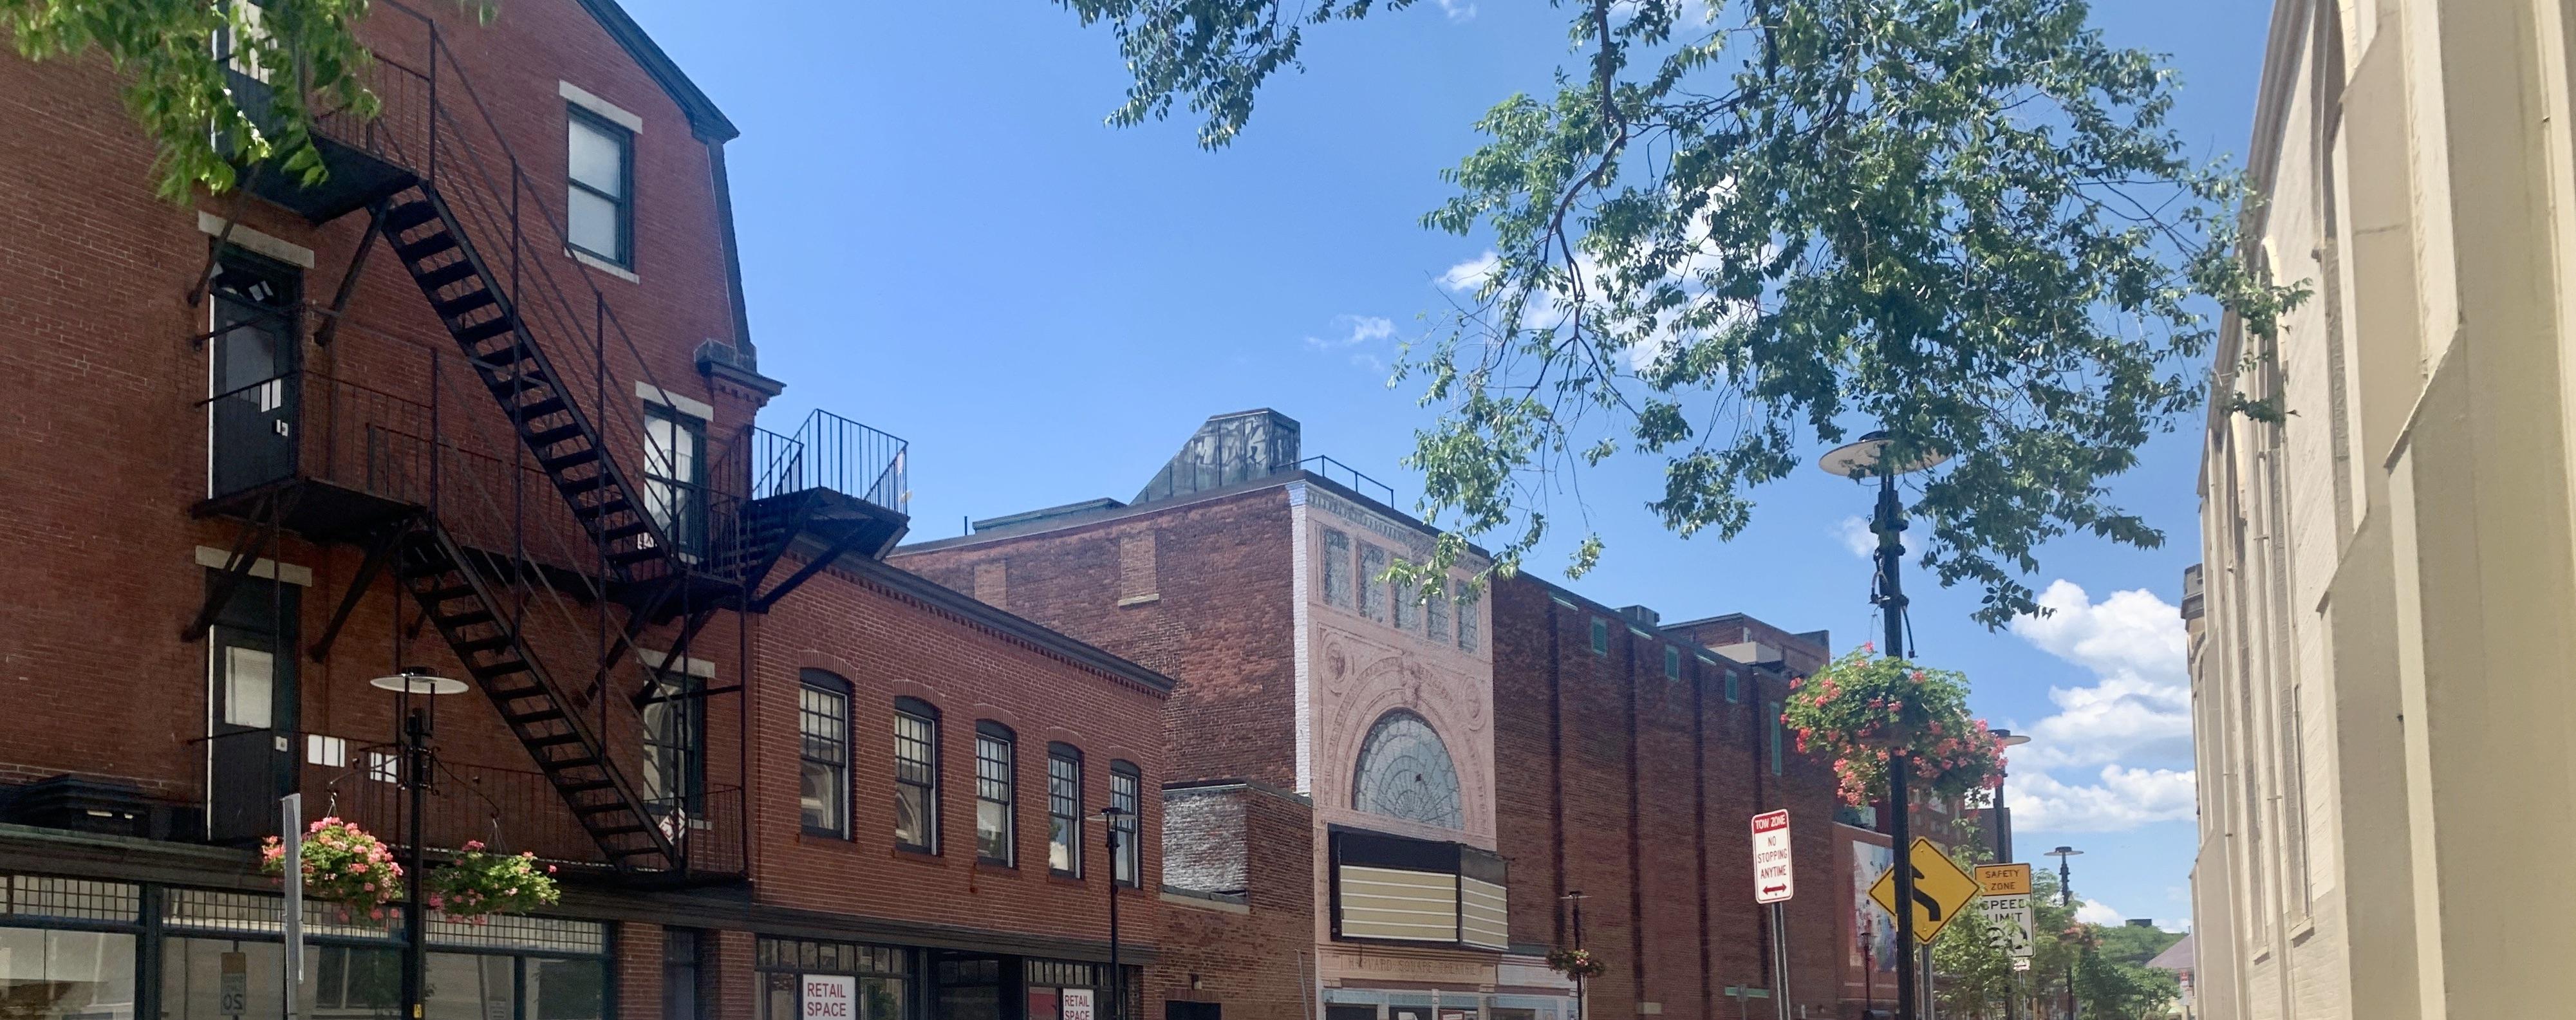 Church Street Retail in Harvard Square